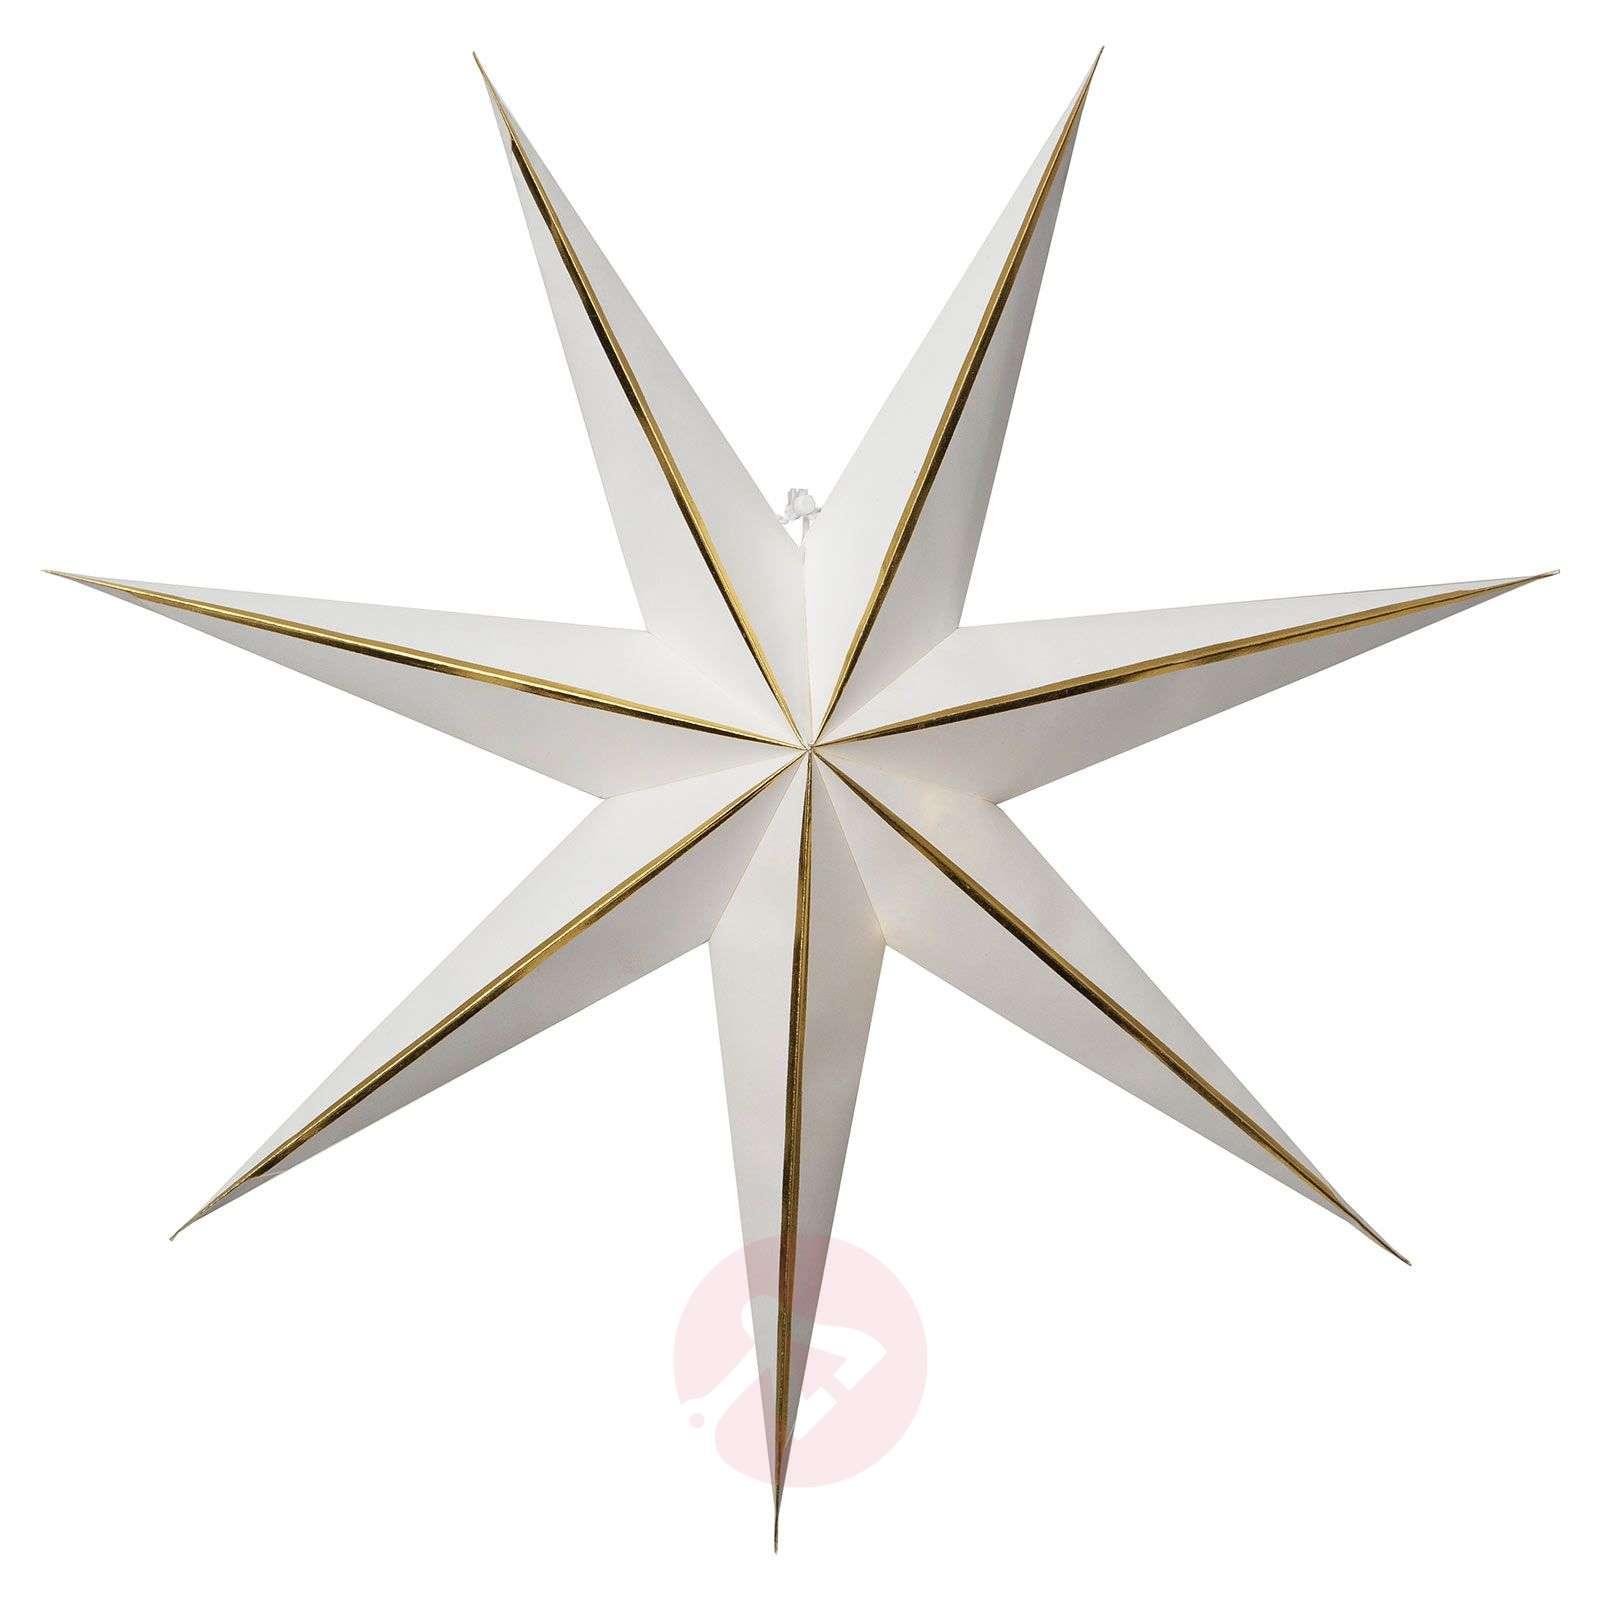 Lysa star, paper, 60 cm diameter-1523737X-01